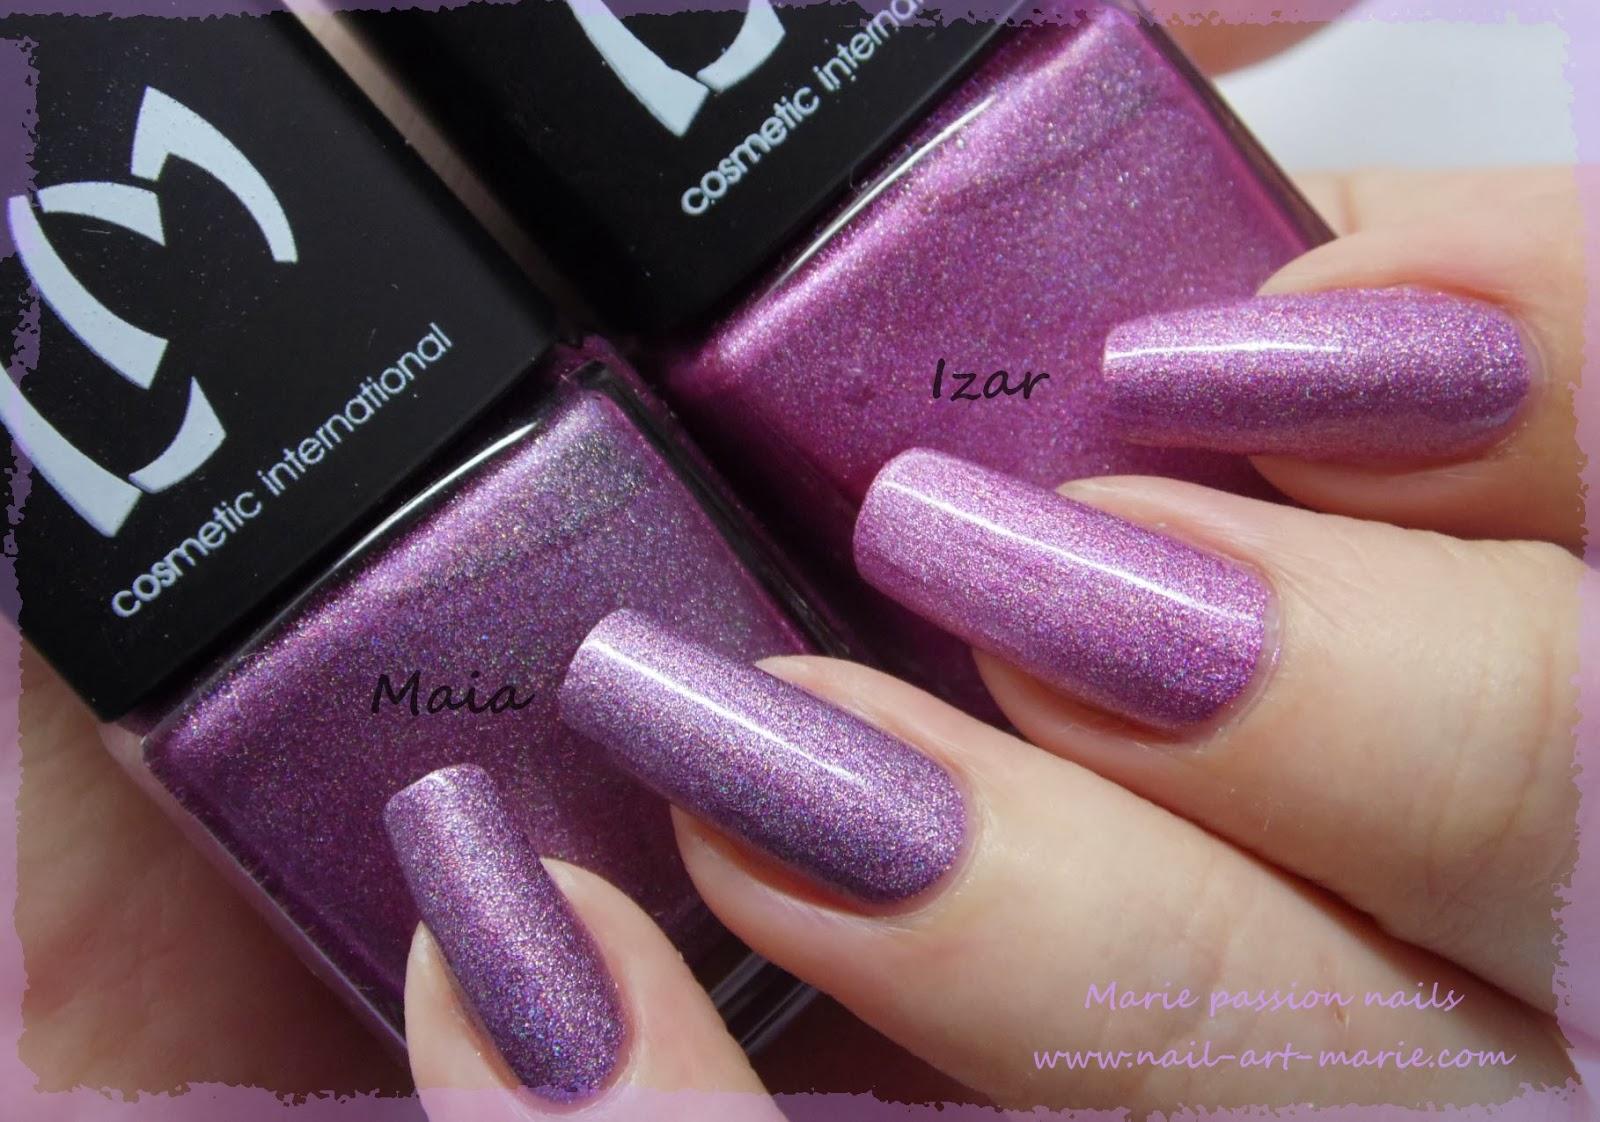 LM Cosmetic Izar et Maia2